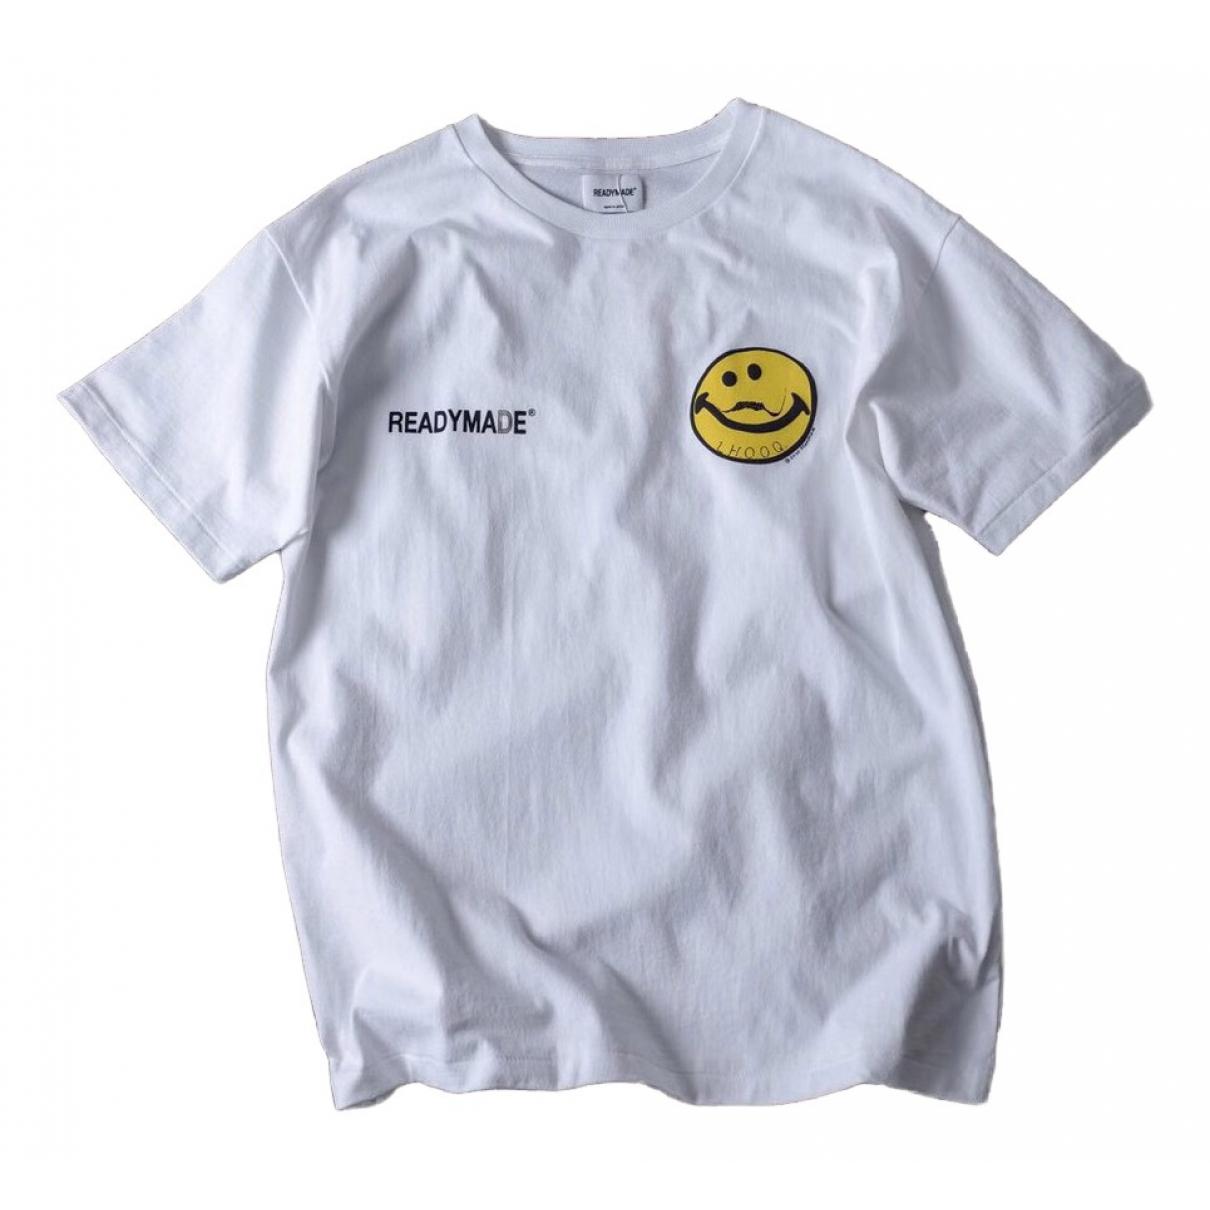 Readymade - Tee shirts   pour homme en coton - blanc